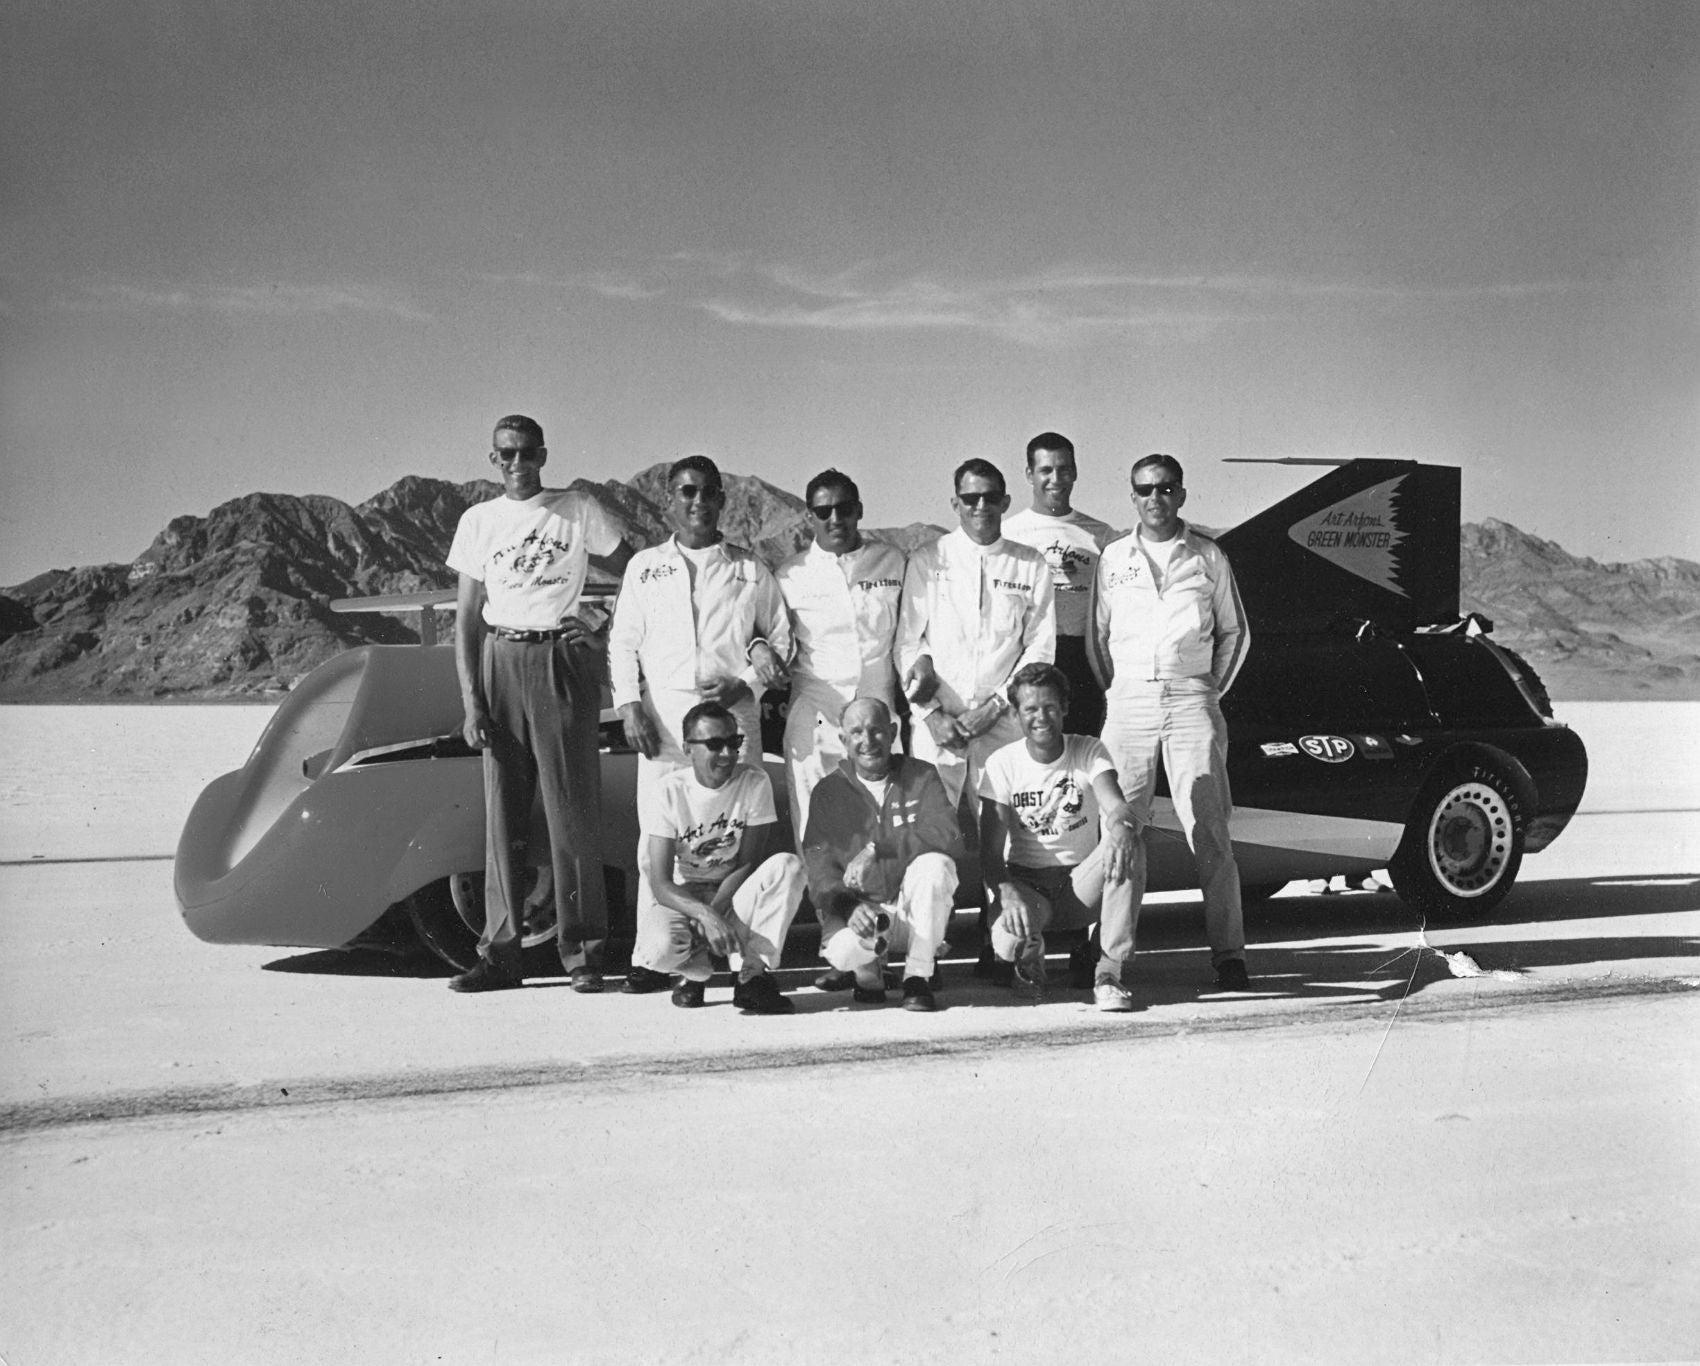 p247 The Green Monster crew October 1964 Photo Credit Tom Mayenschein